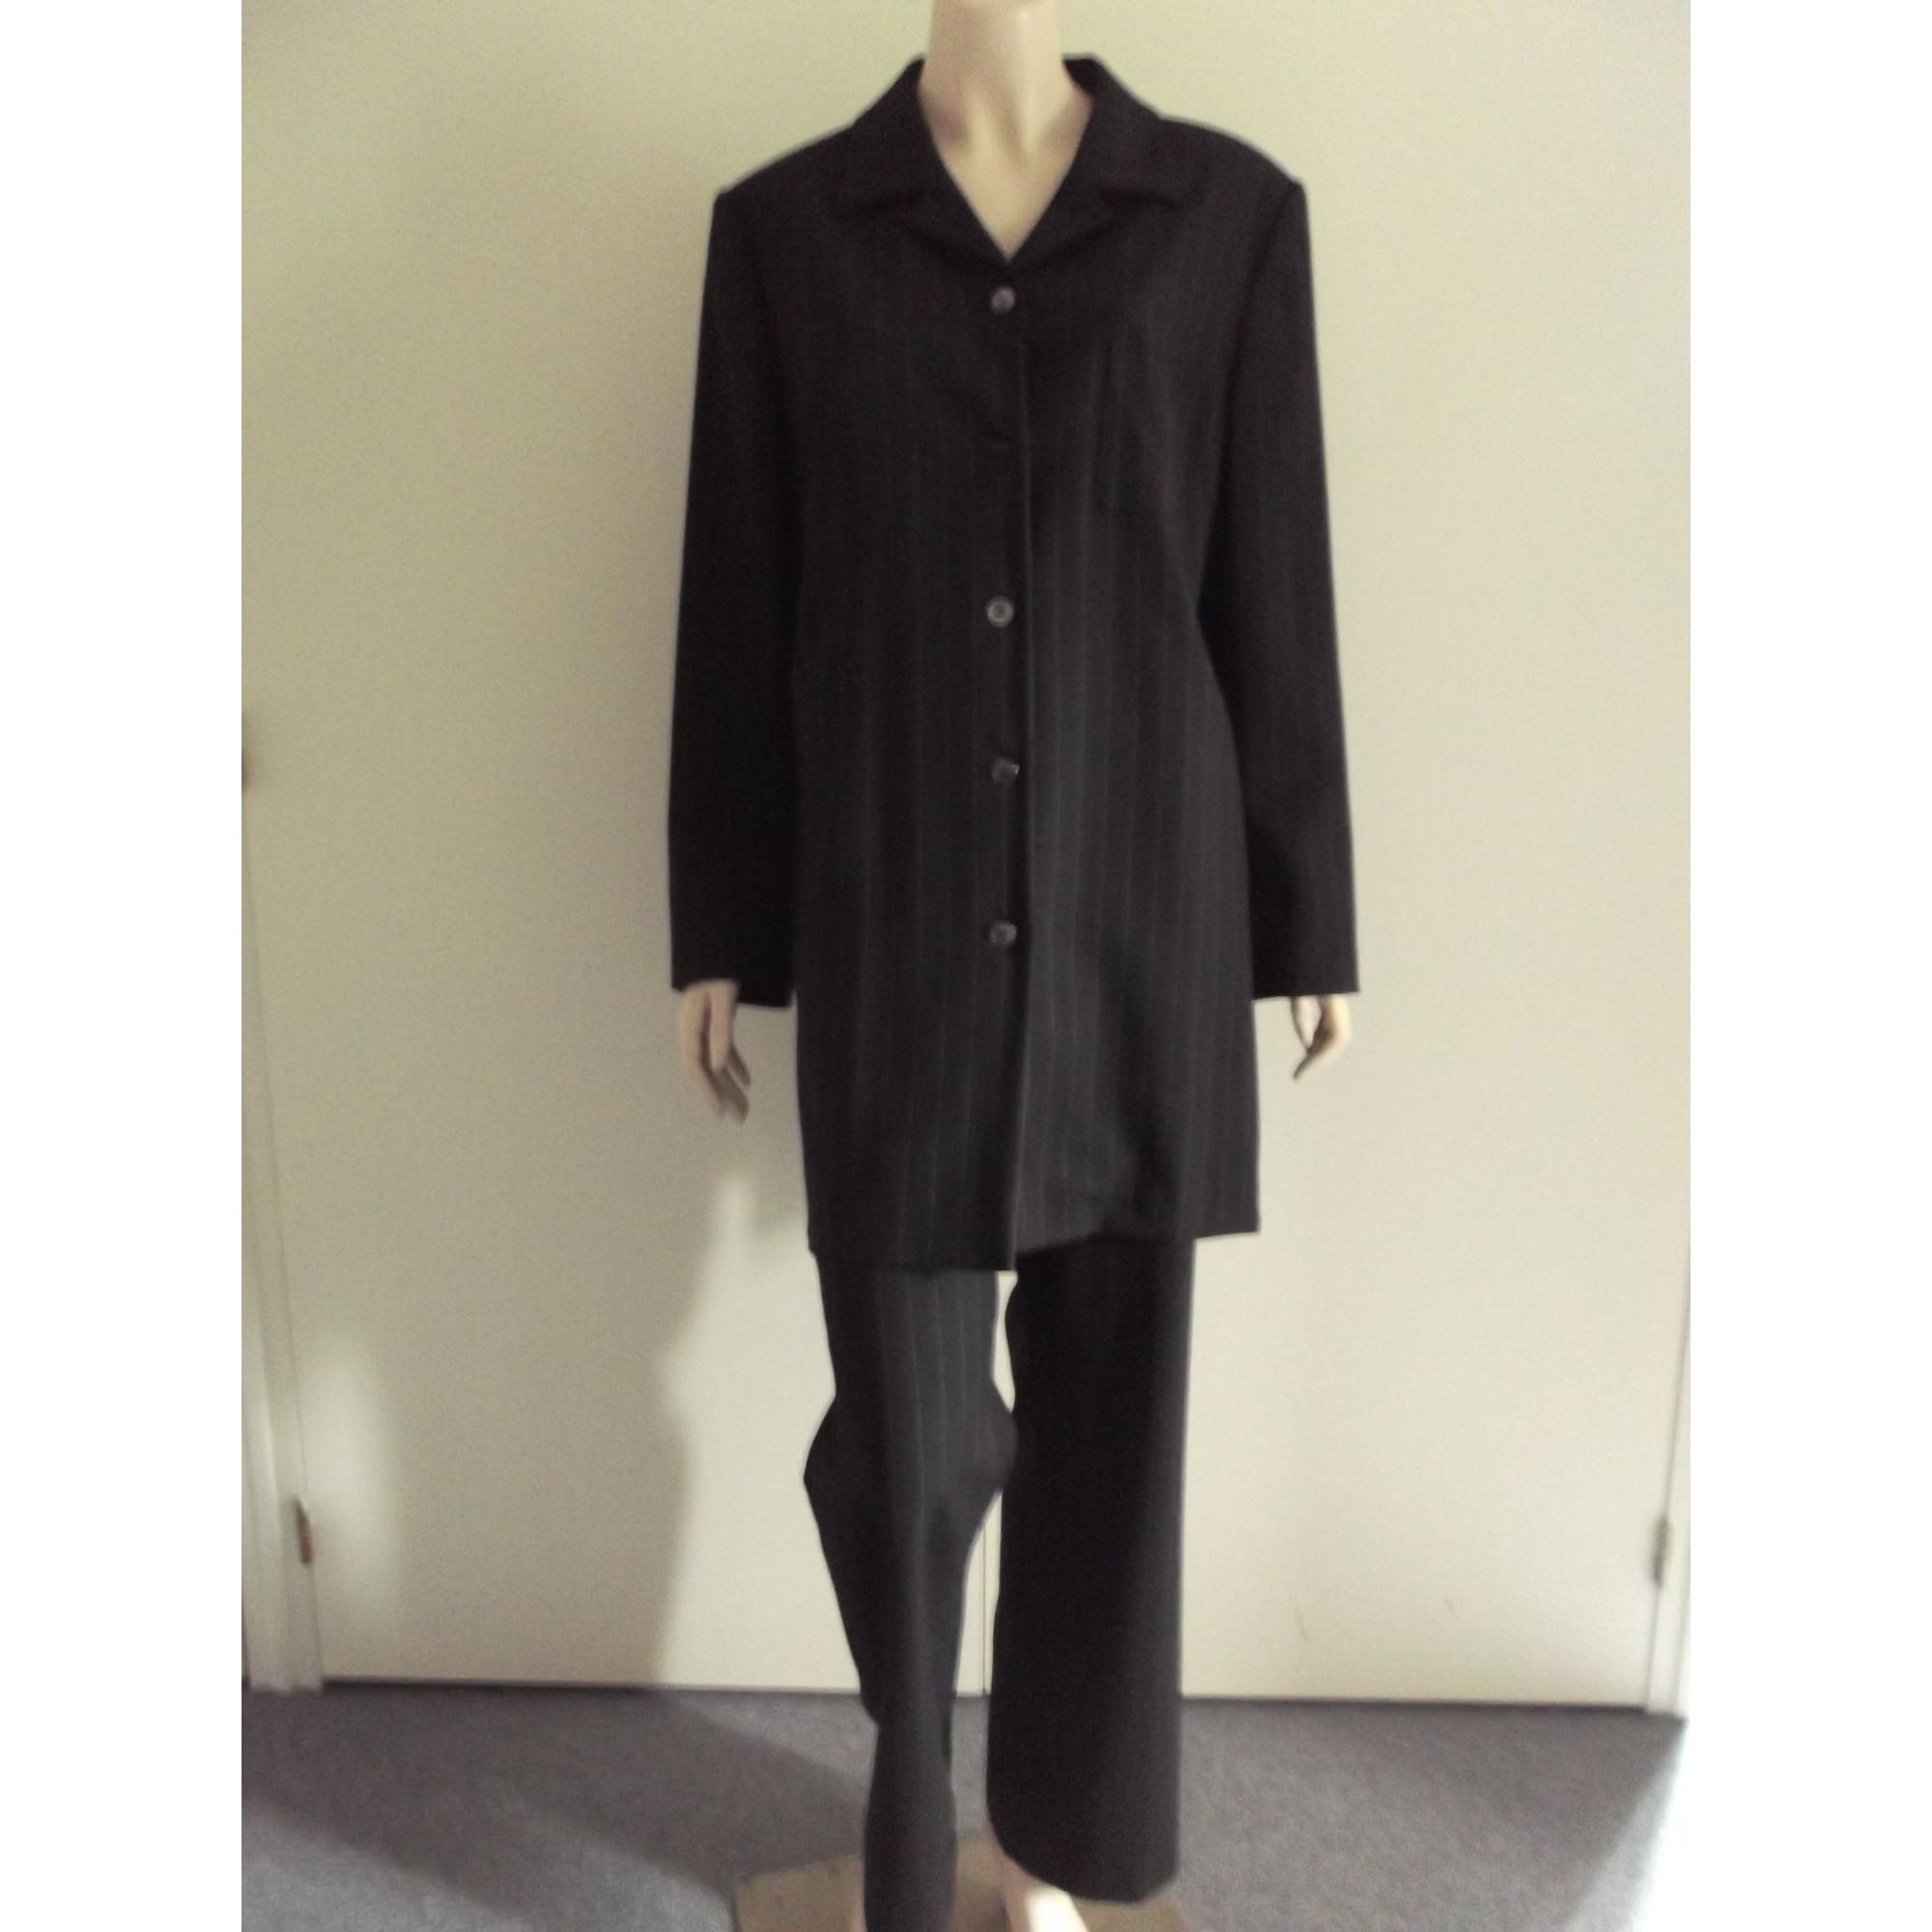 Tailleur pantalon CAROLINE ROHMER Gris, anthracite